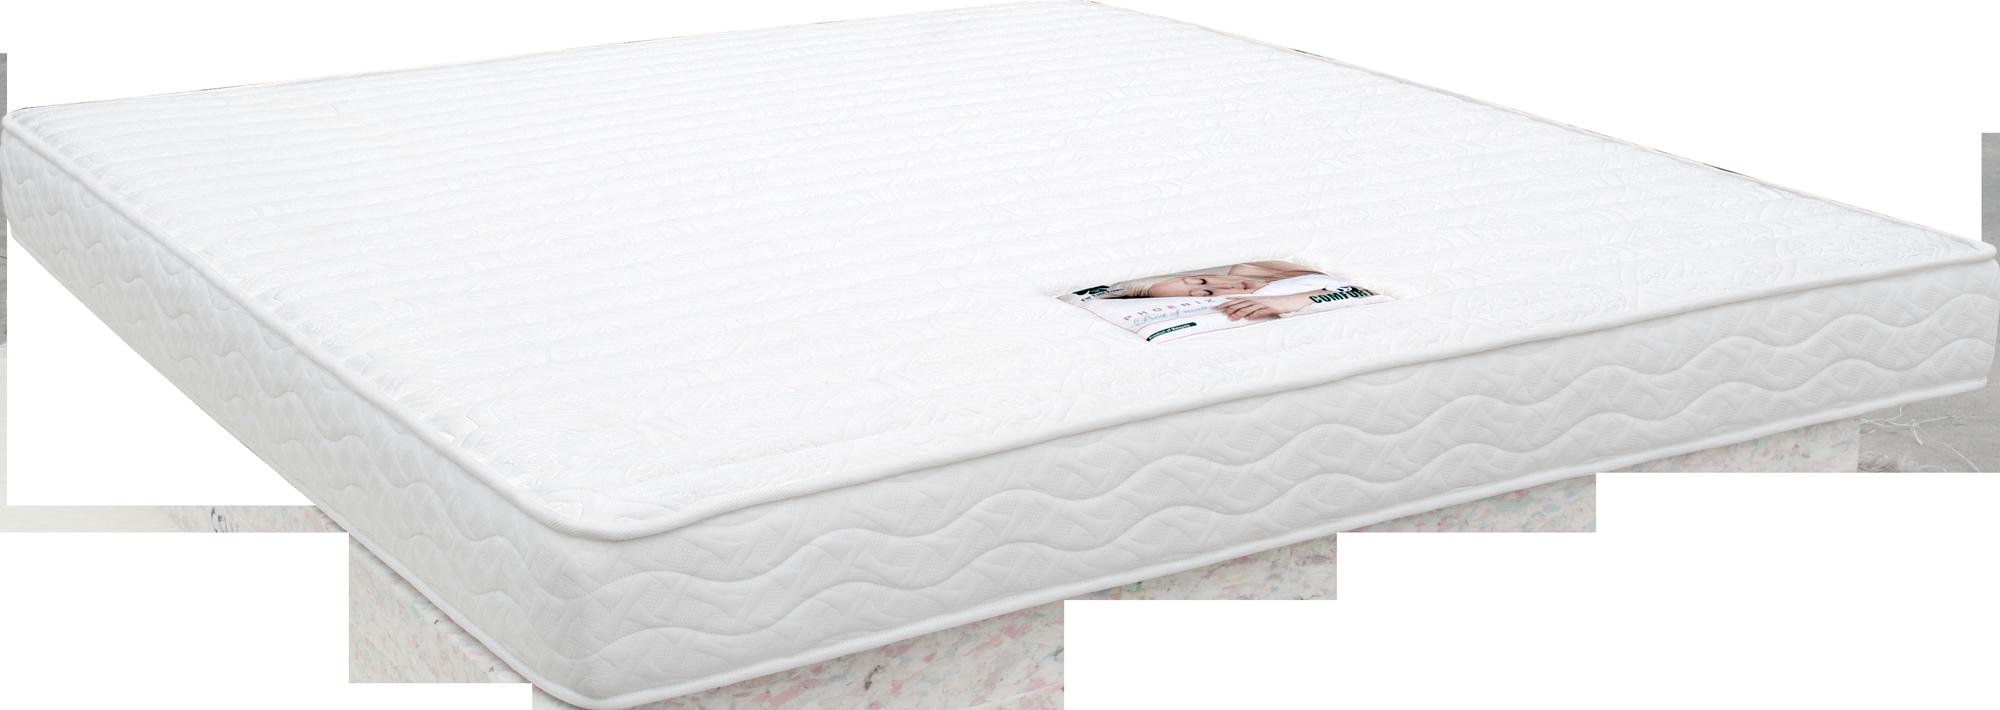 Products Comfort Mattress Vietnam